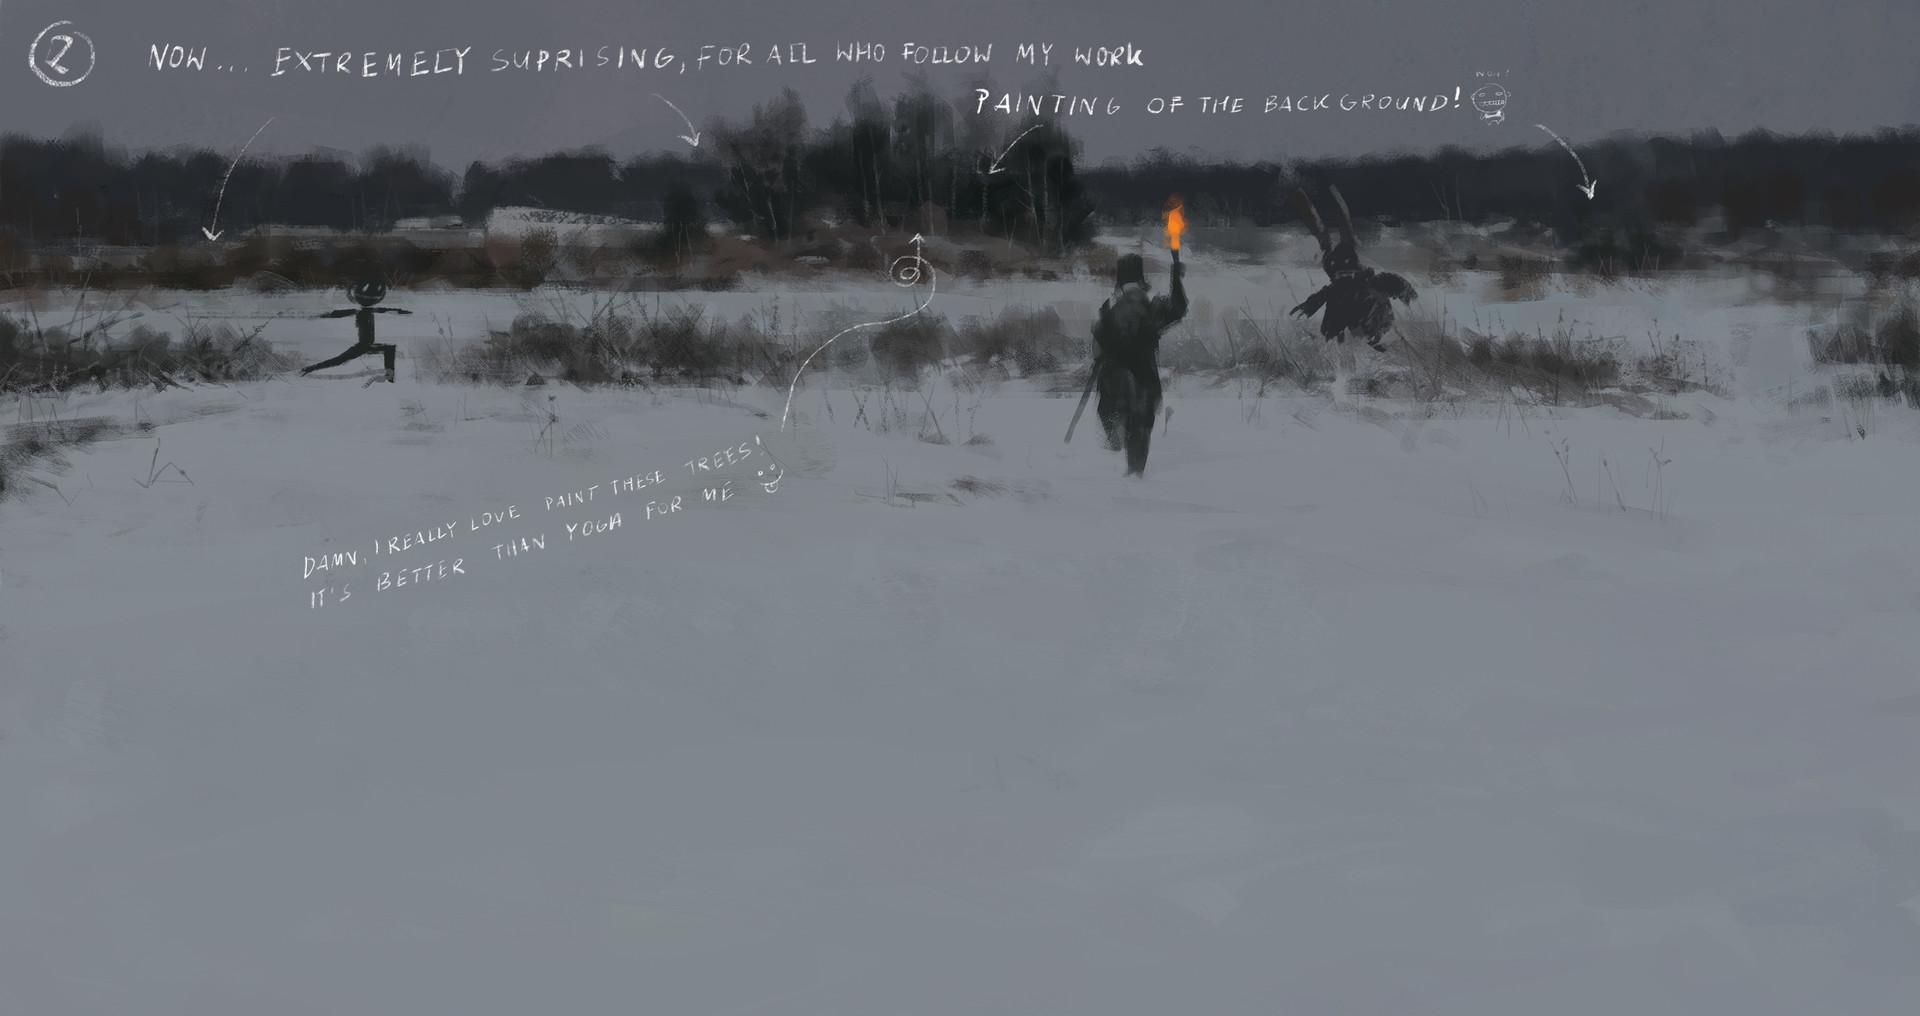 Jakub rozalski wolfpack hunt01 14112016 process02